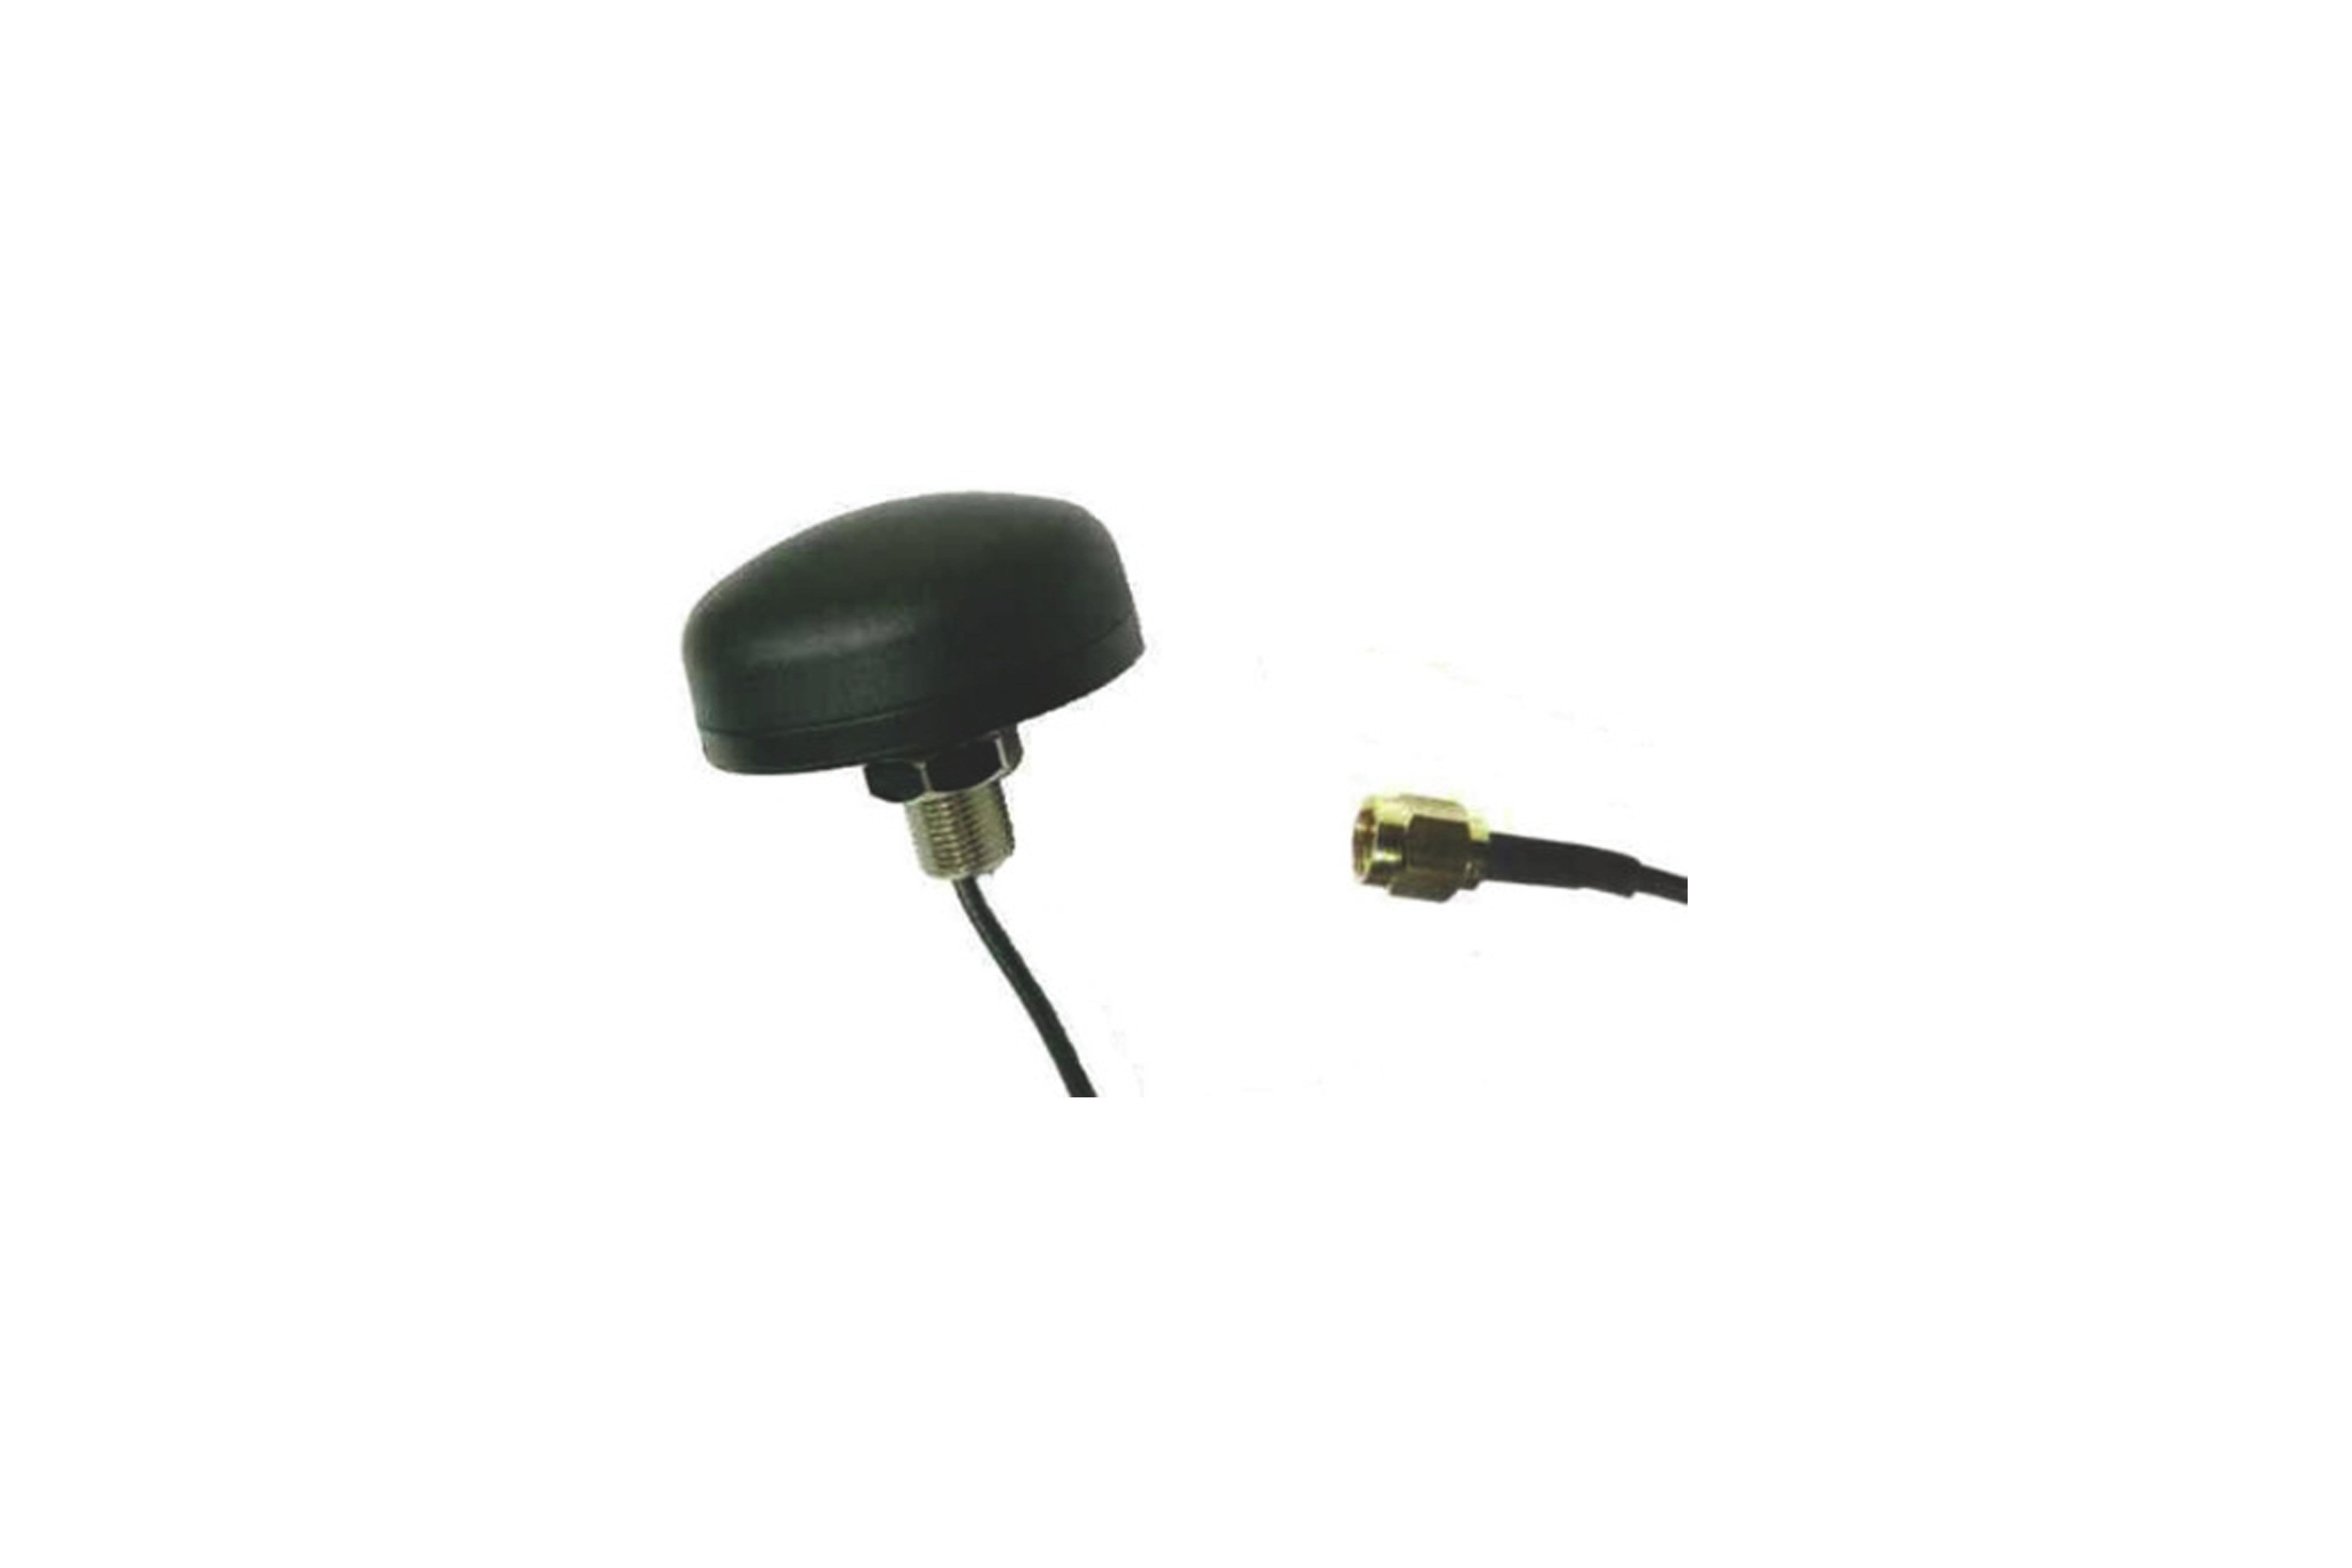 PUK Antenne 433/868 MHz M14-Schraube SMA(M)